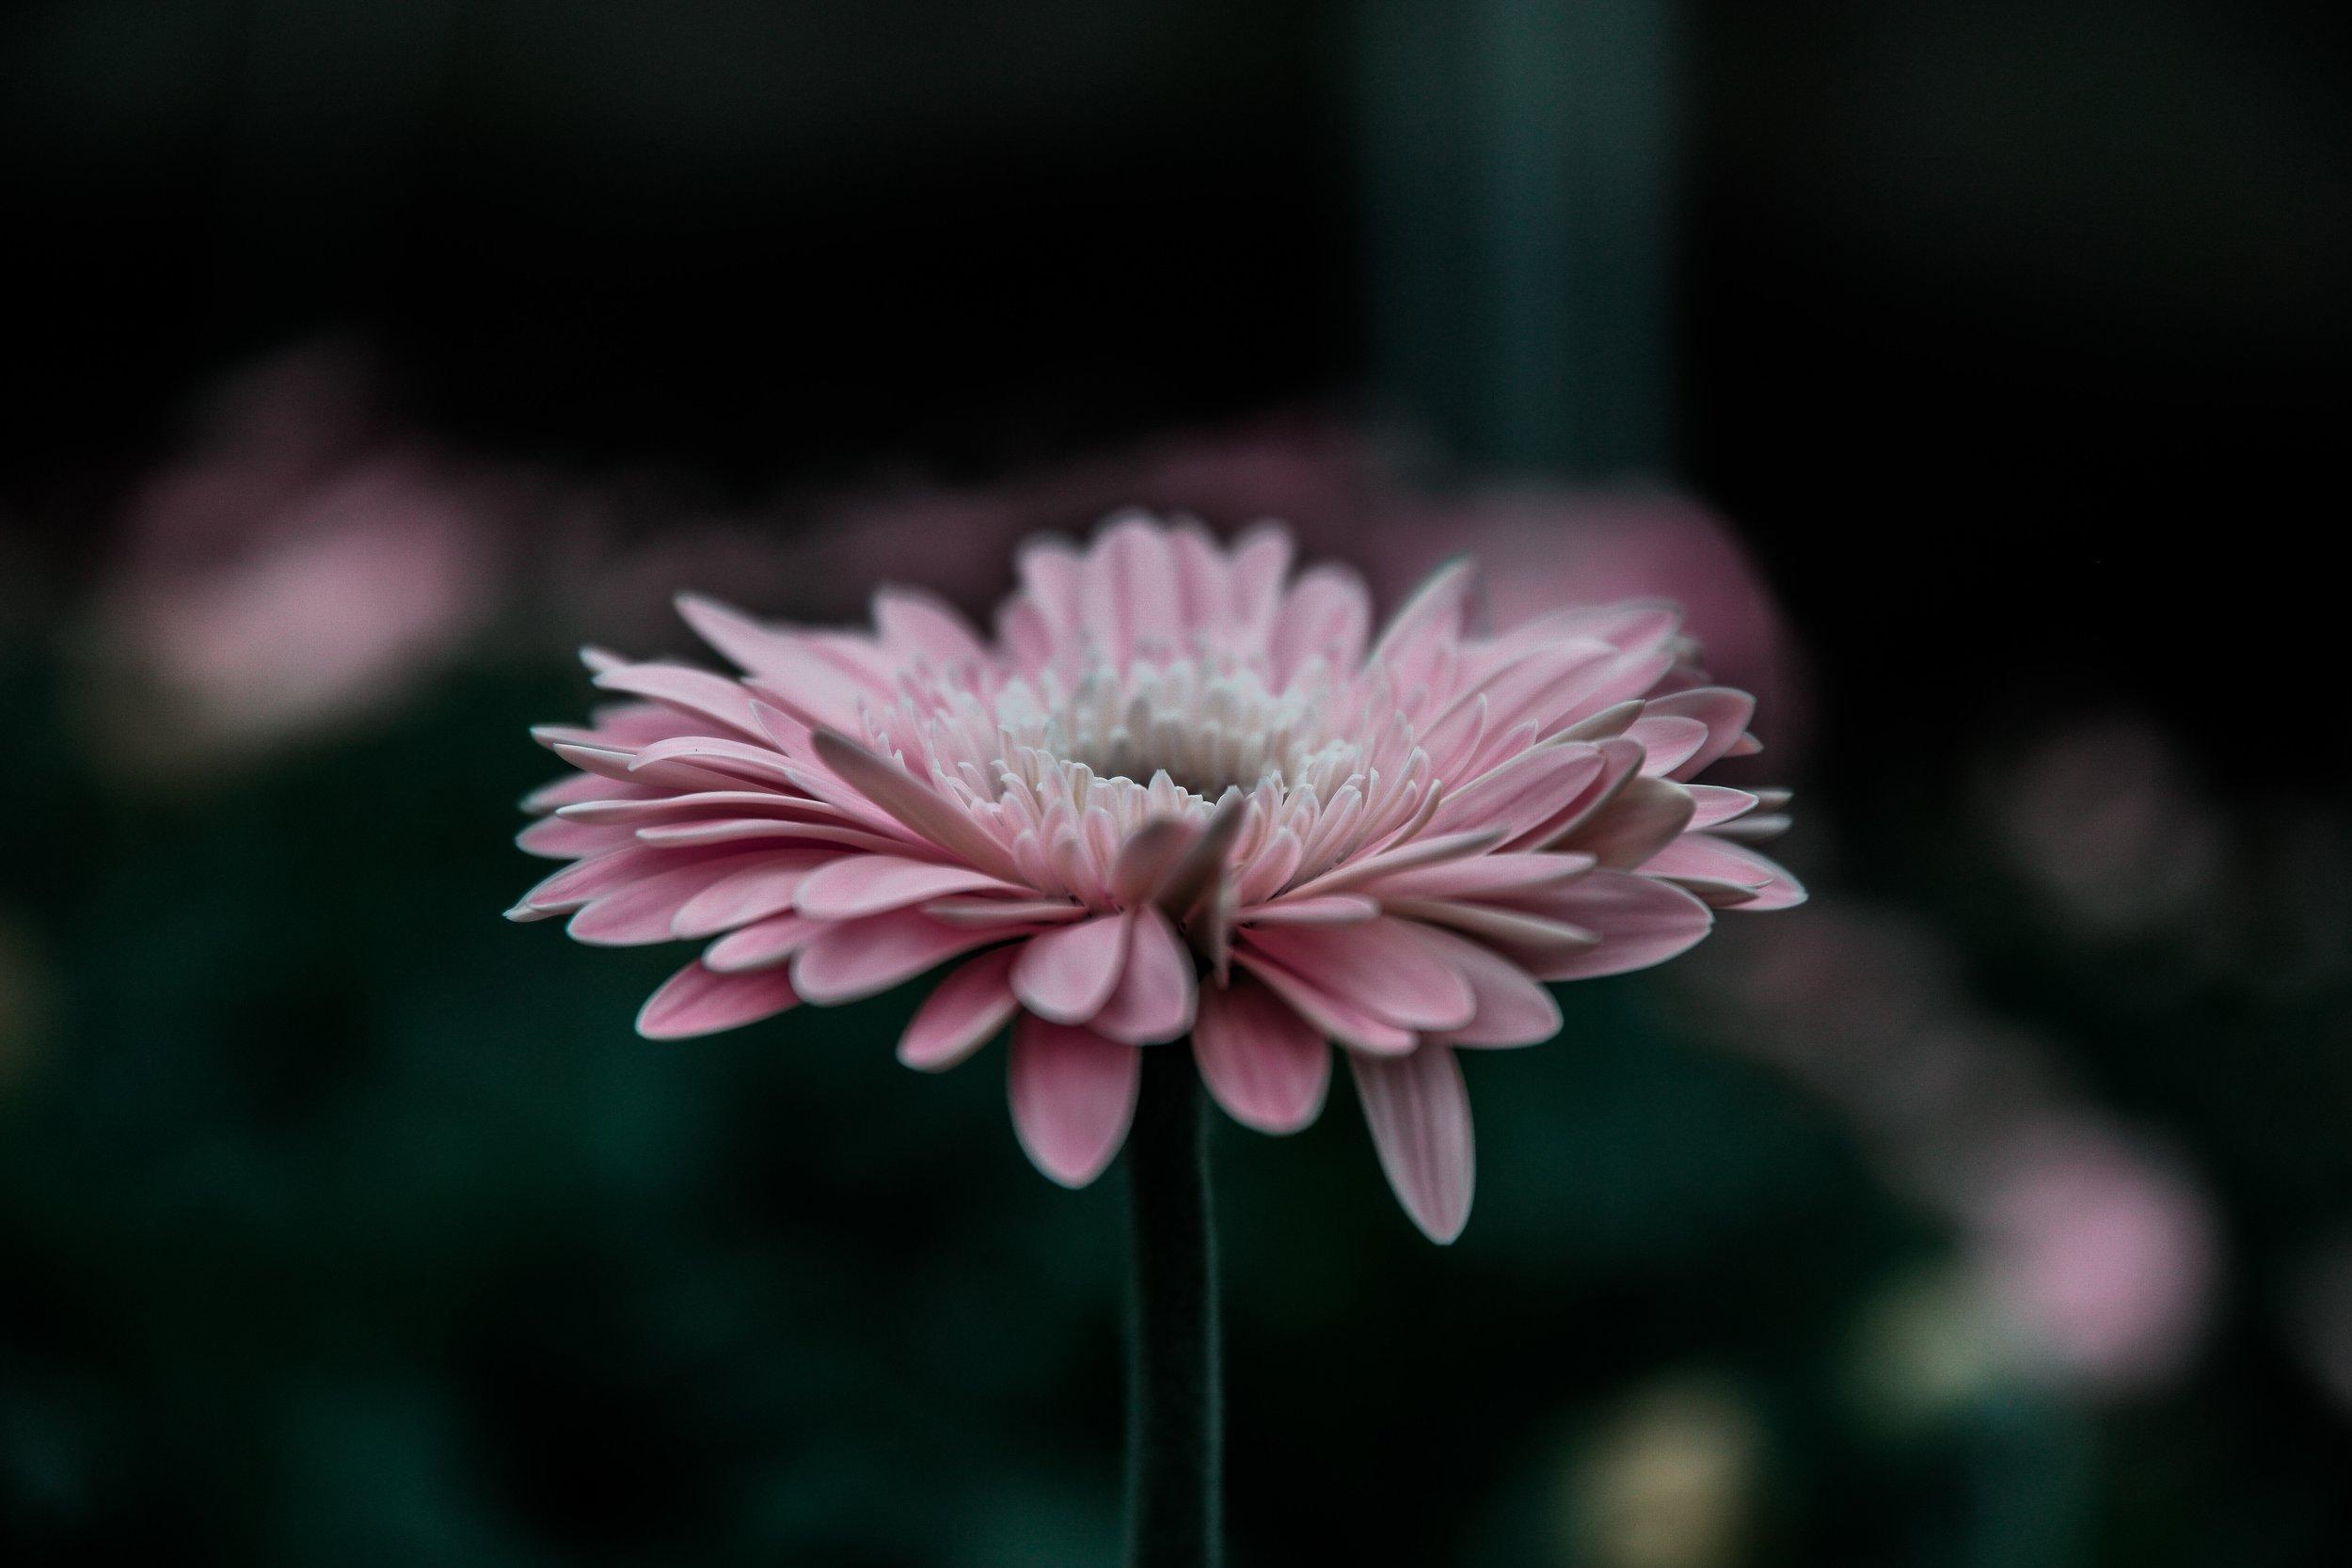 flower-pink-31459.jpg